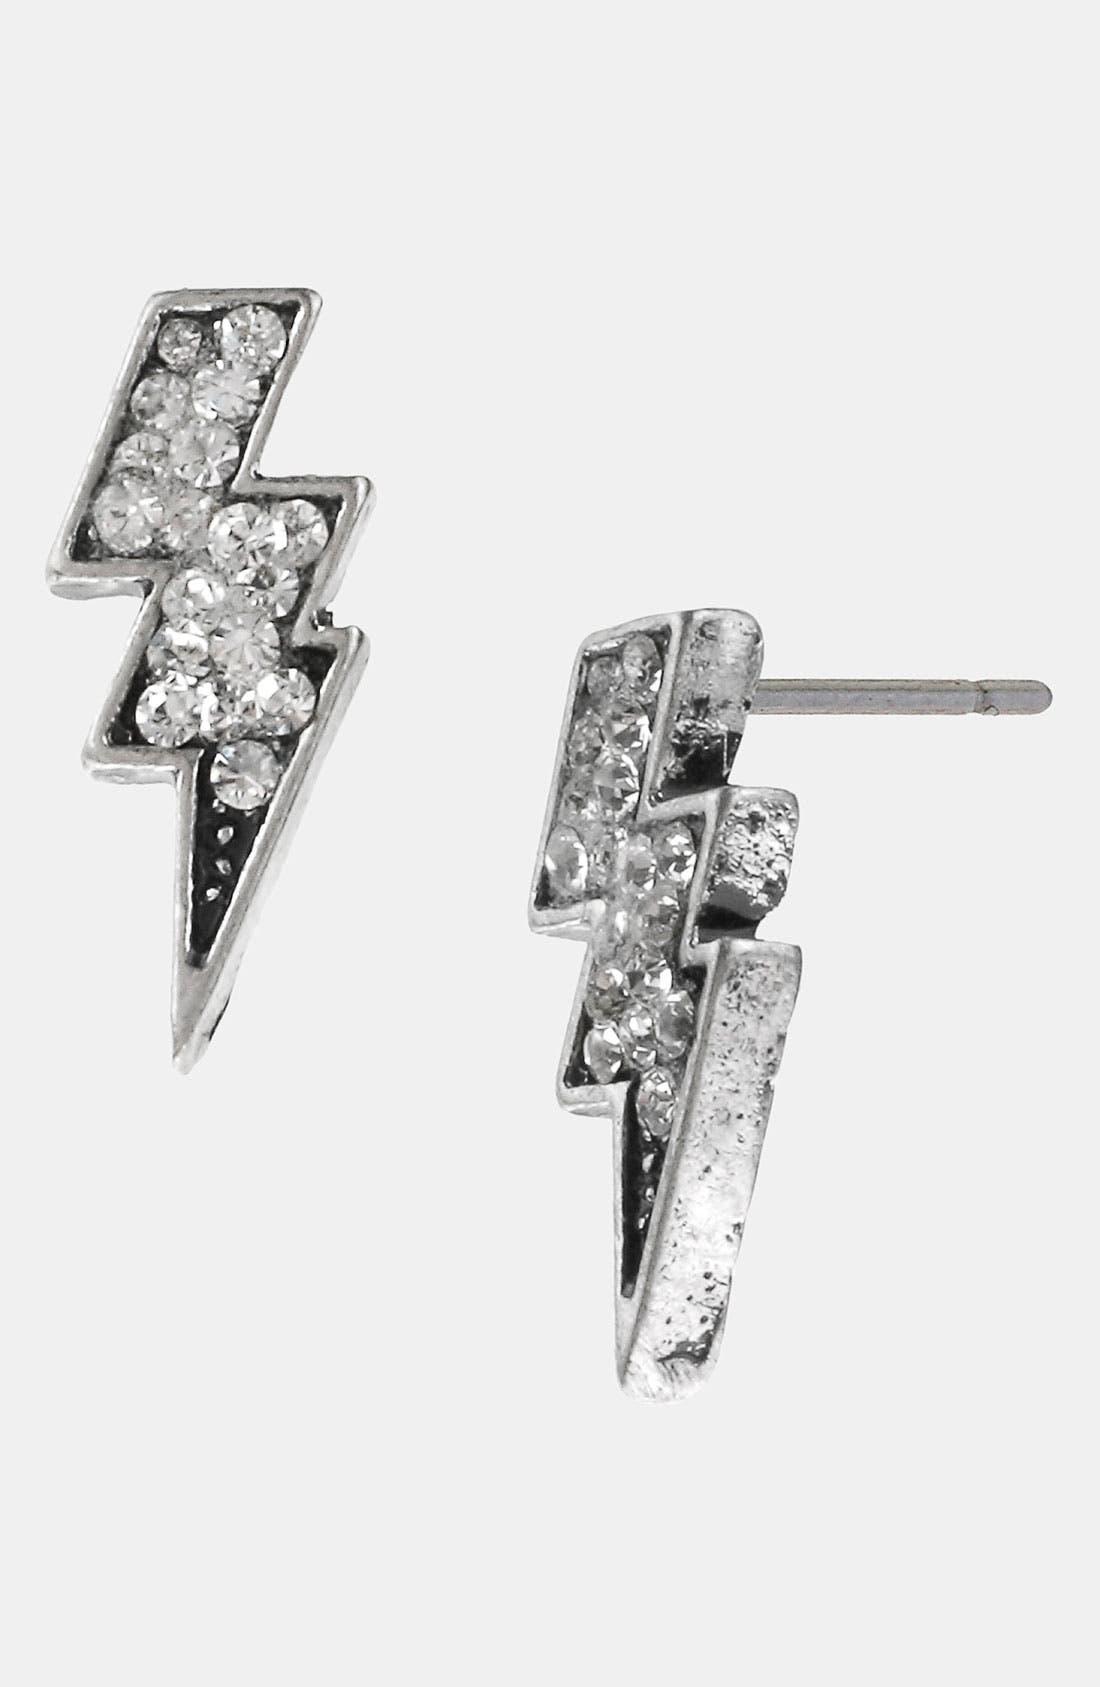 Alternate Image 1 Selected - Betsey Johnson 'Black Label' Crystal Bolt Stud Earrings